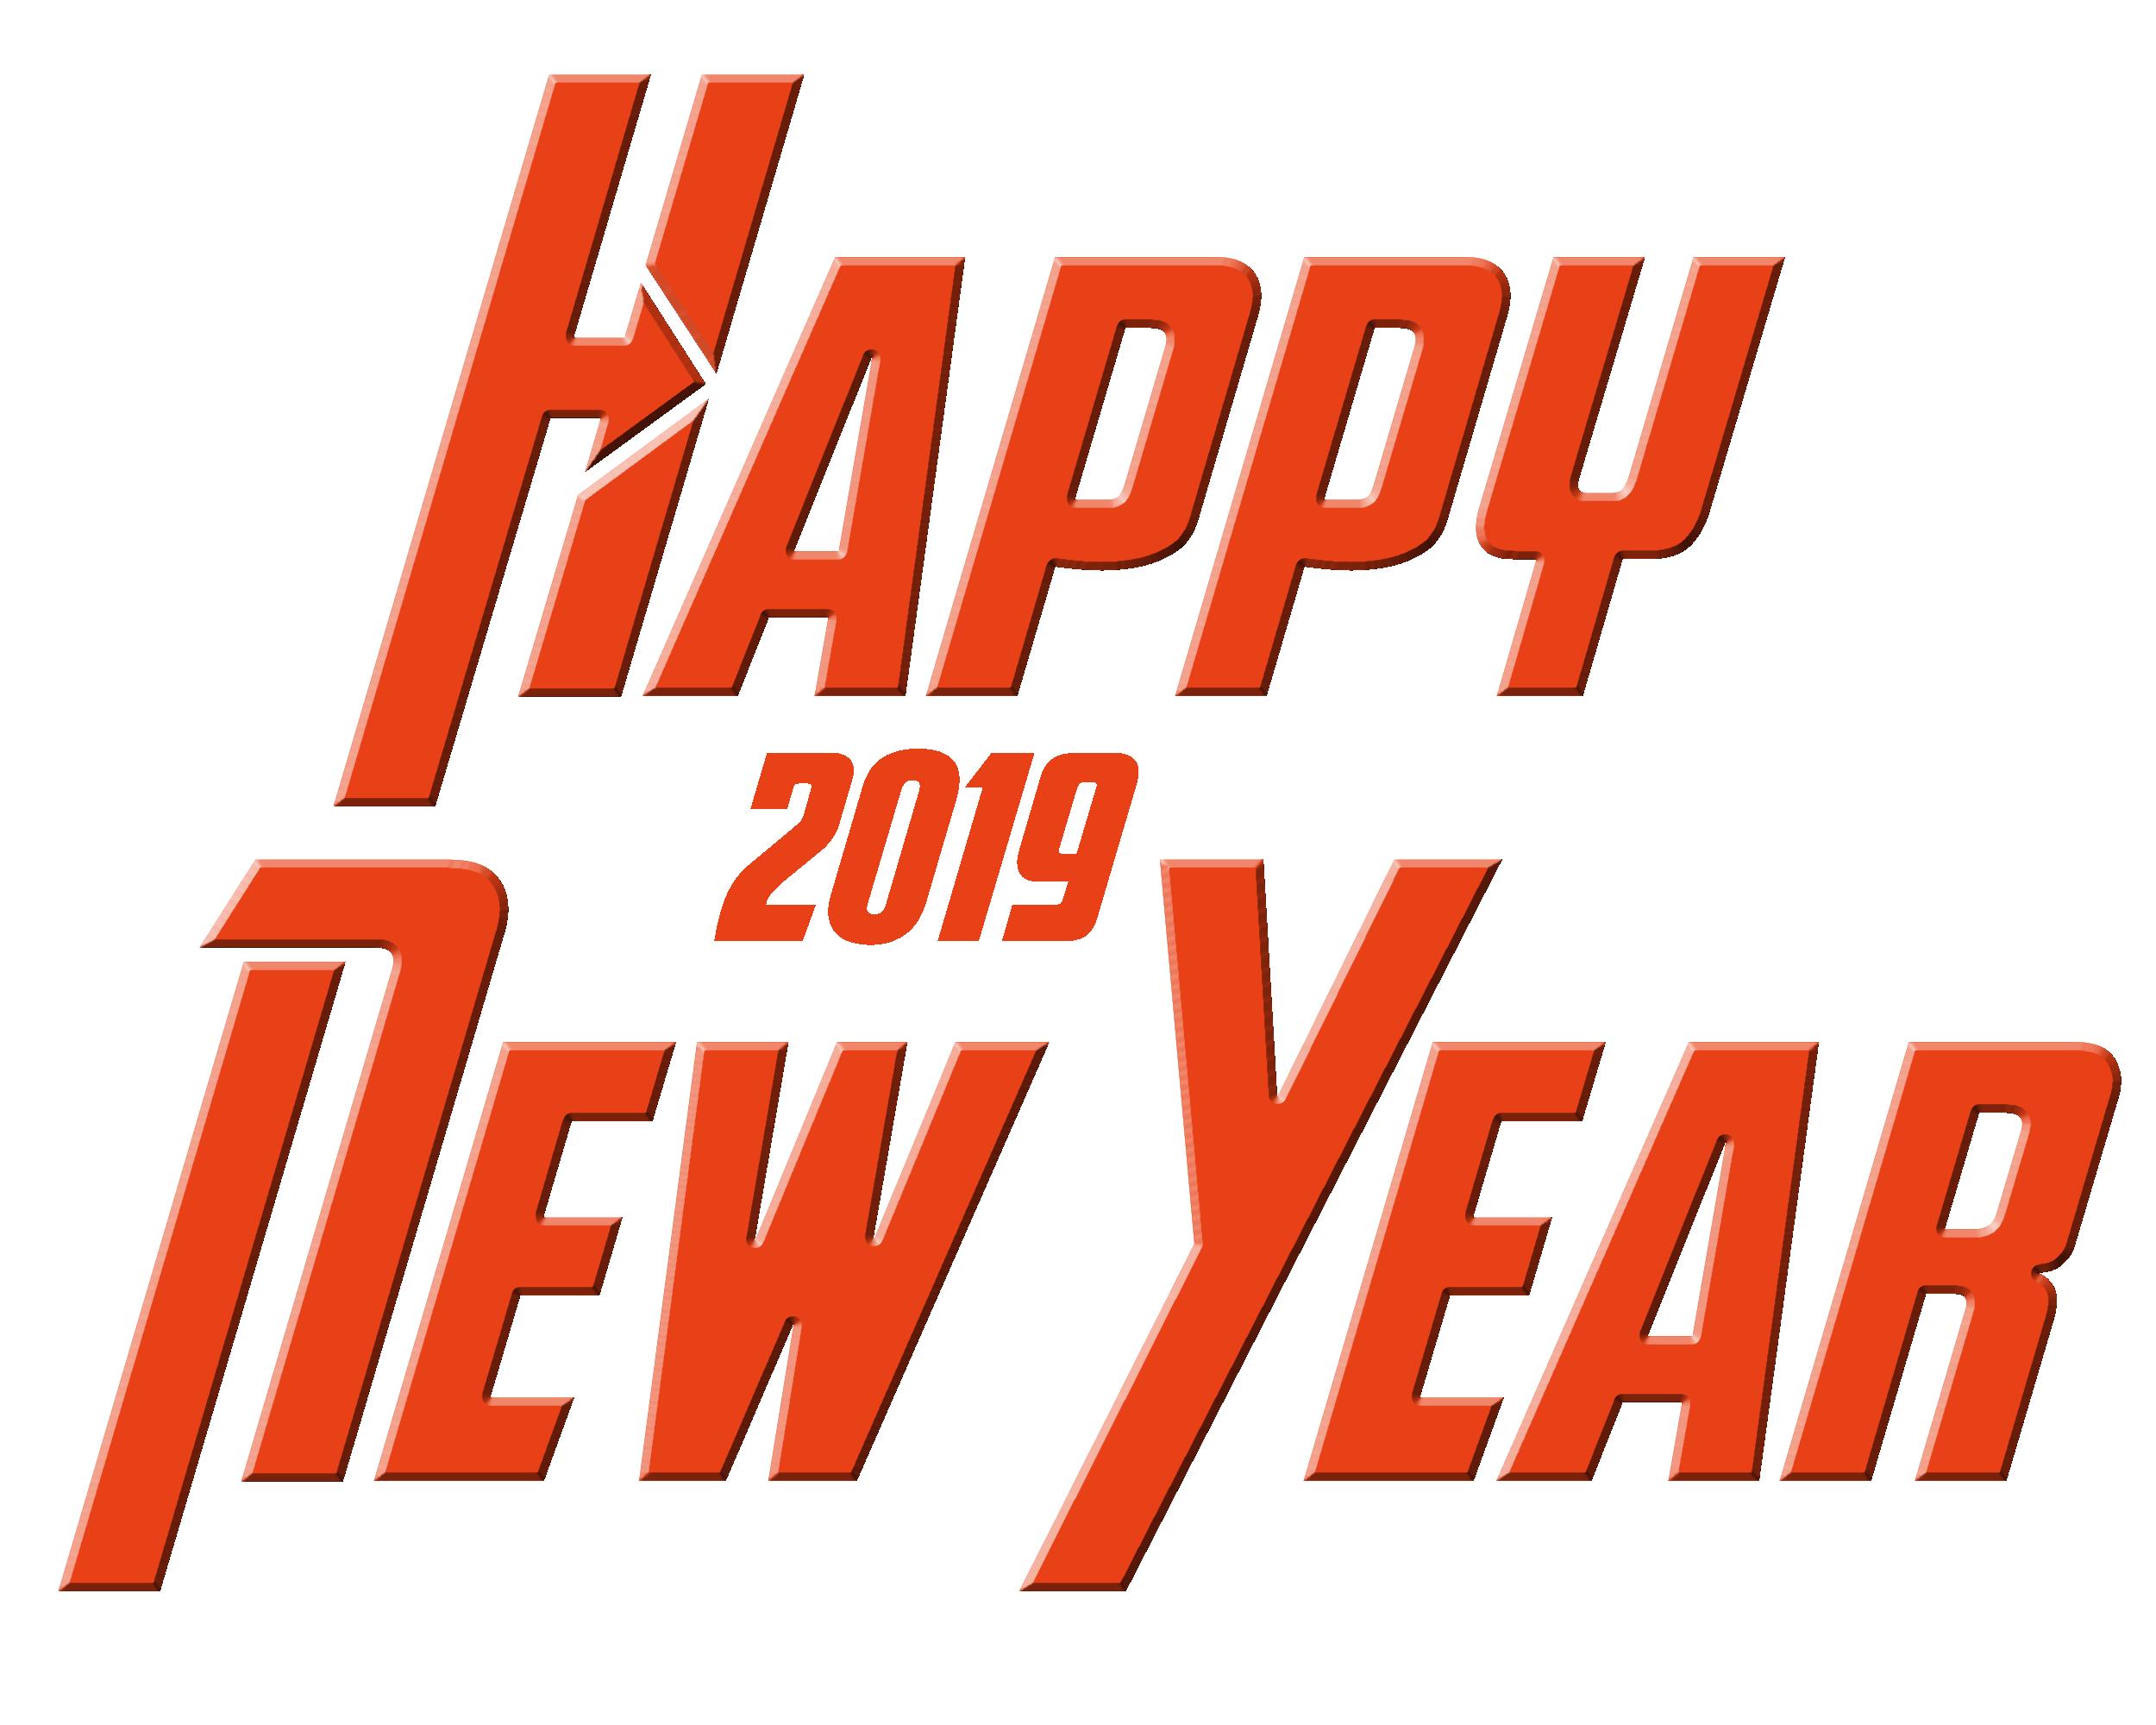 Happy New Year Text 27